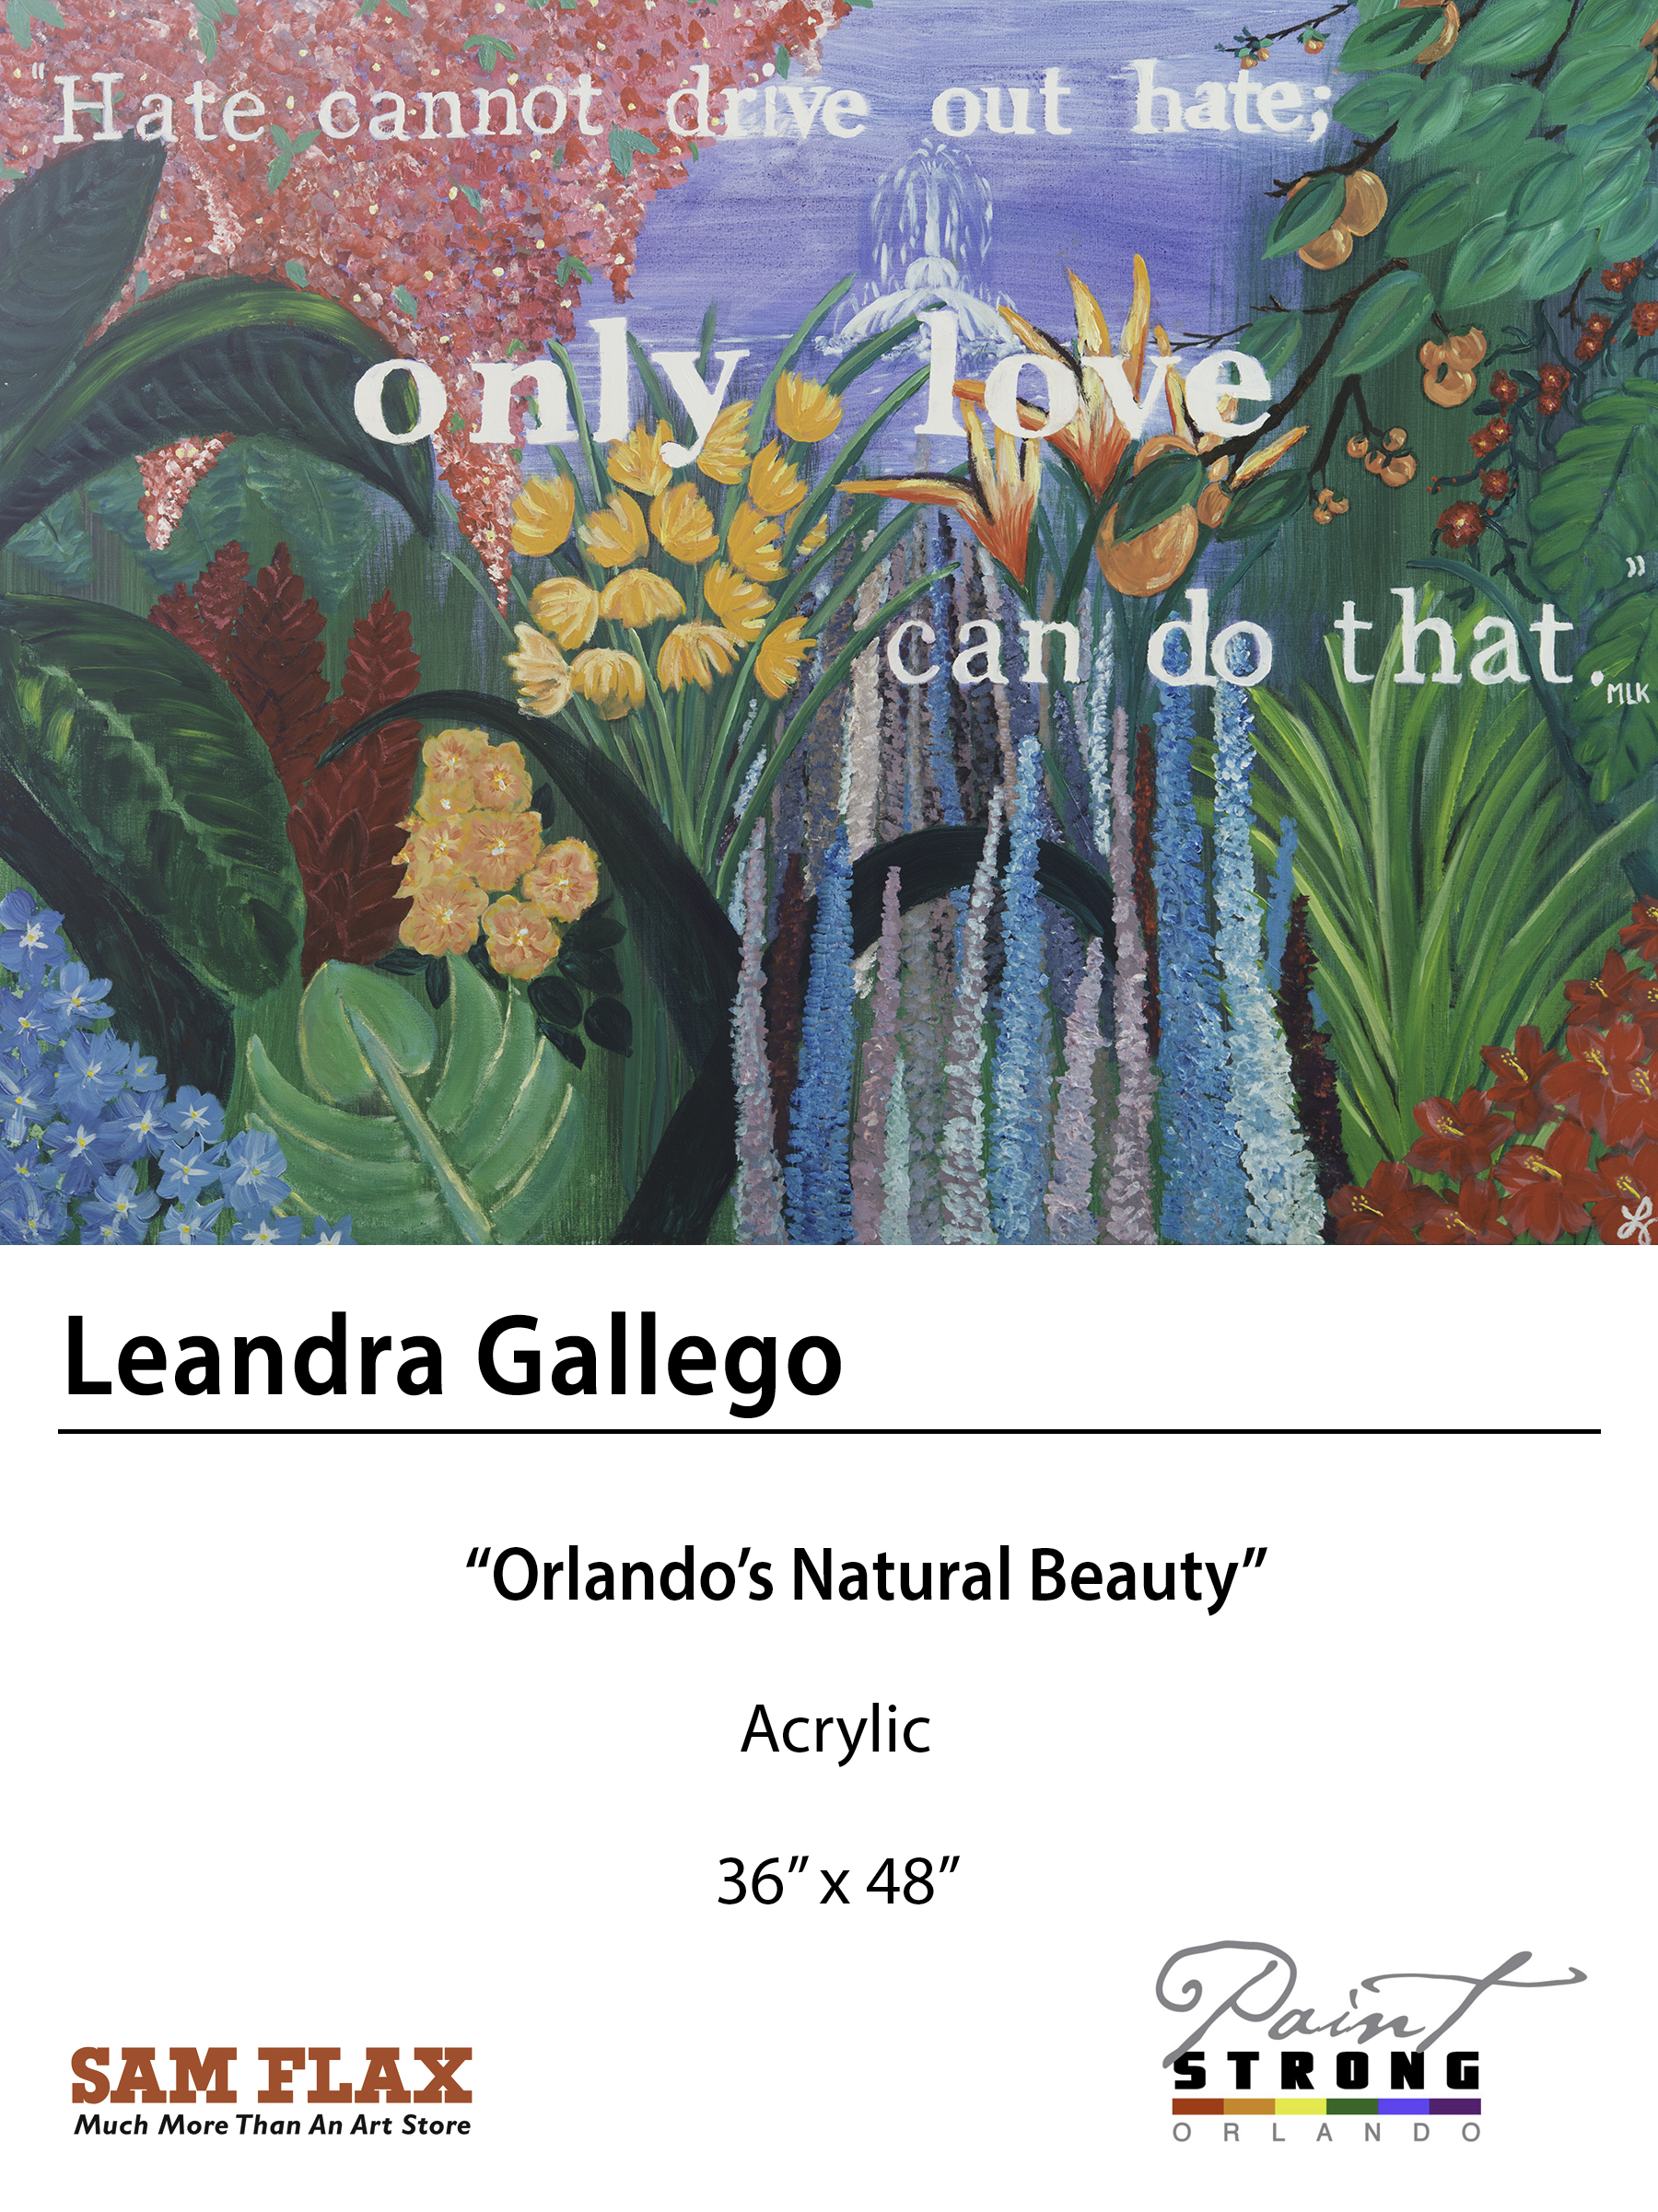 Leandra Gallego